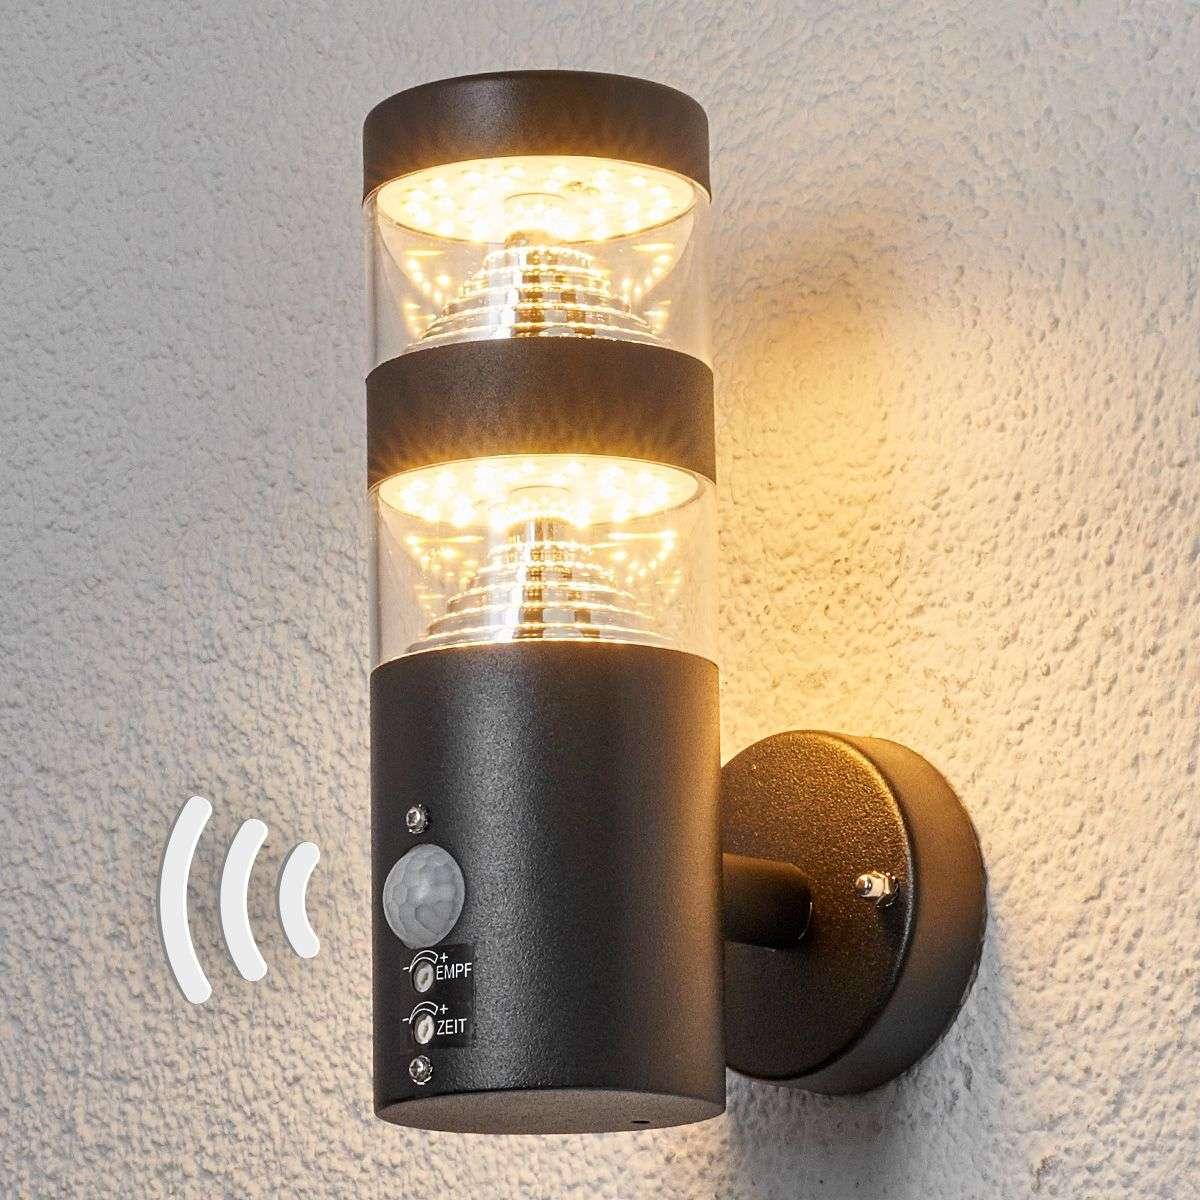 Outdoor Wall Light With Sensor - Outdoor Lighting Ideas